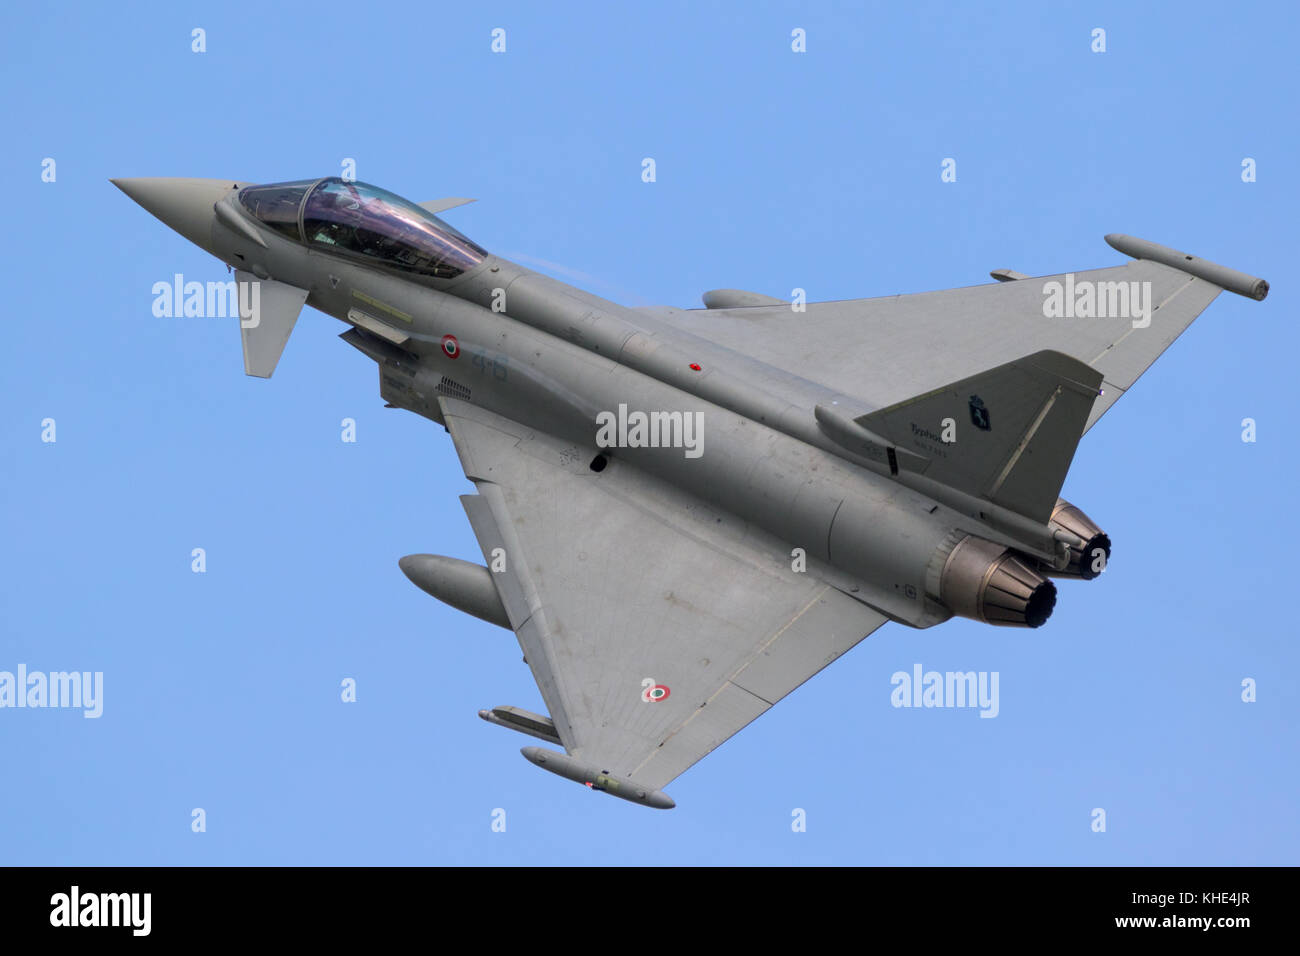 FLORENNES, BELGIUM - JUN 15, 2017: Italian Air Force Eurofighter Typhoon fighter jet aircraft in flight. Stock Photo